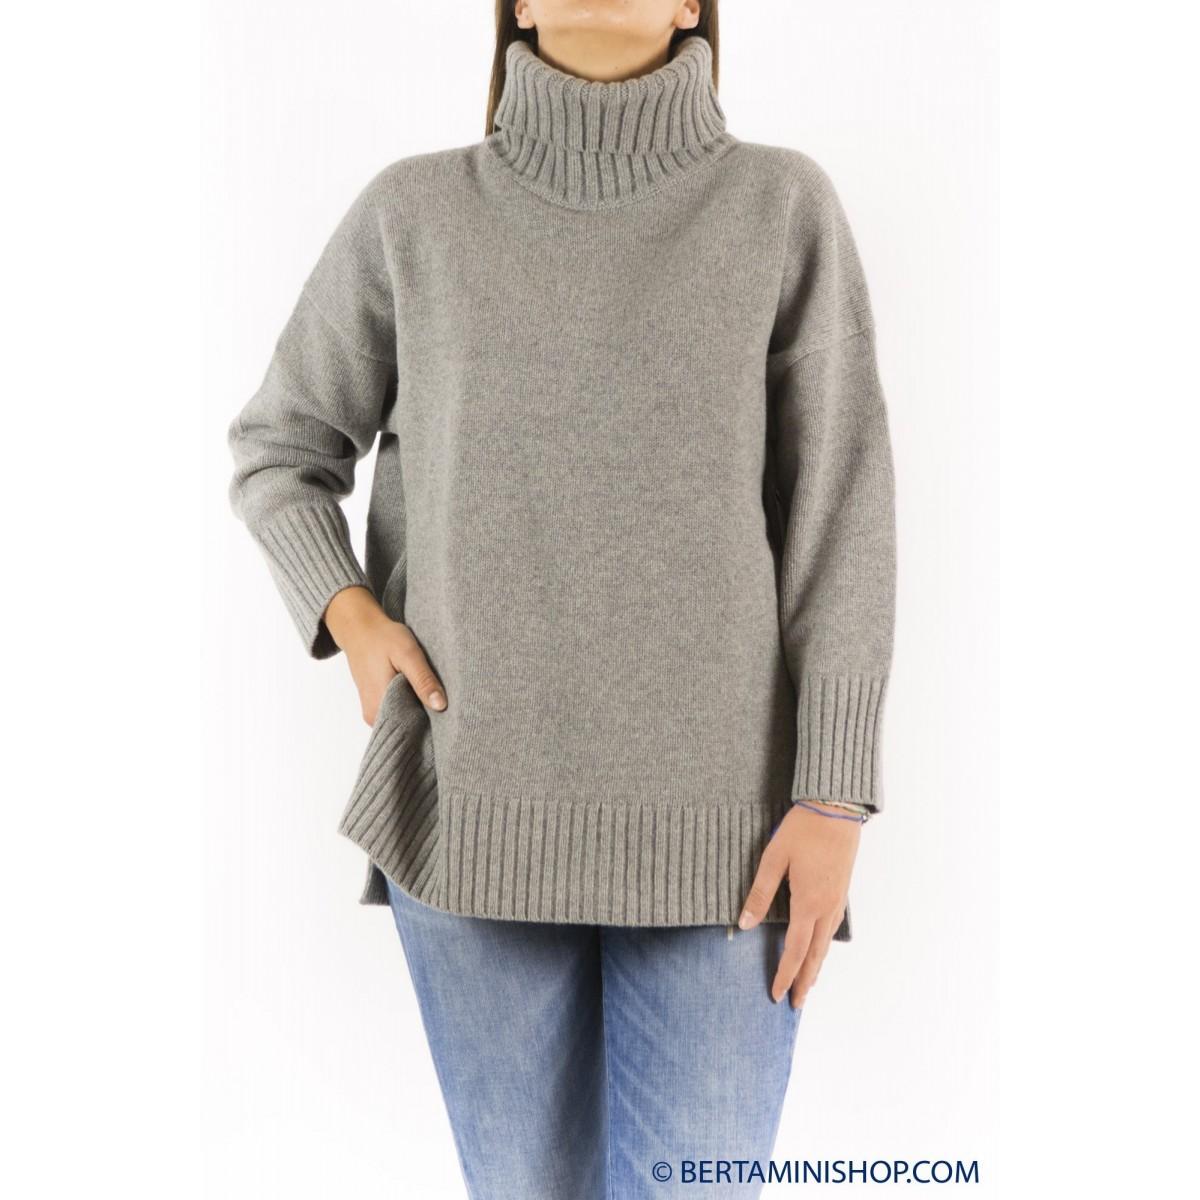 Jumper Ralph Lauren Woman - V39Id318Wd236 BBD17 - Grigio